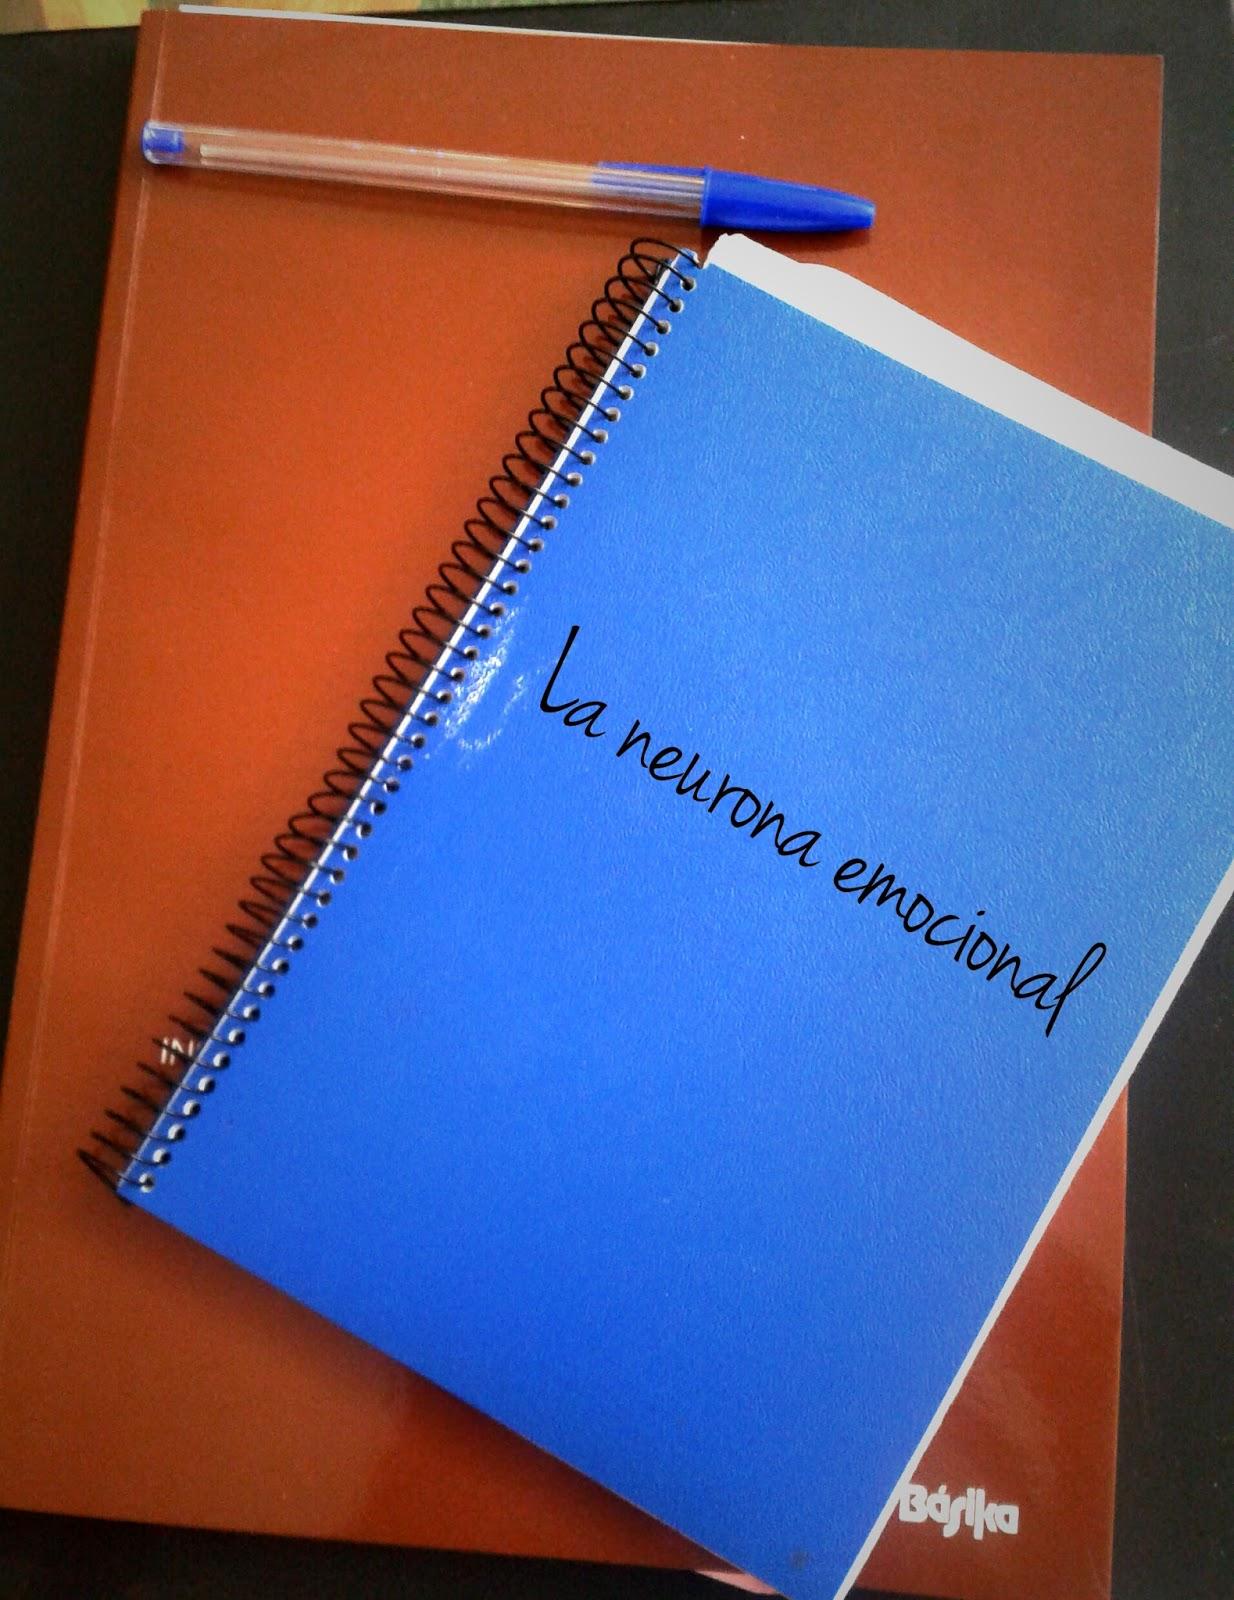 Los Curriculum Vitae | La neurona emocional